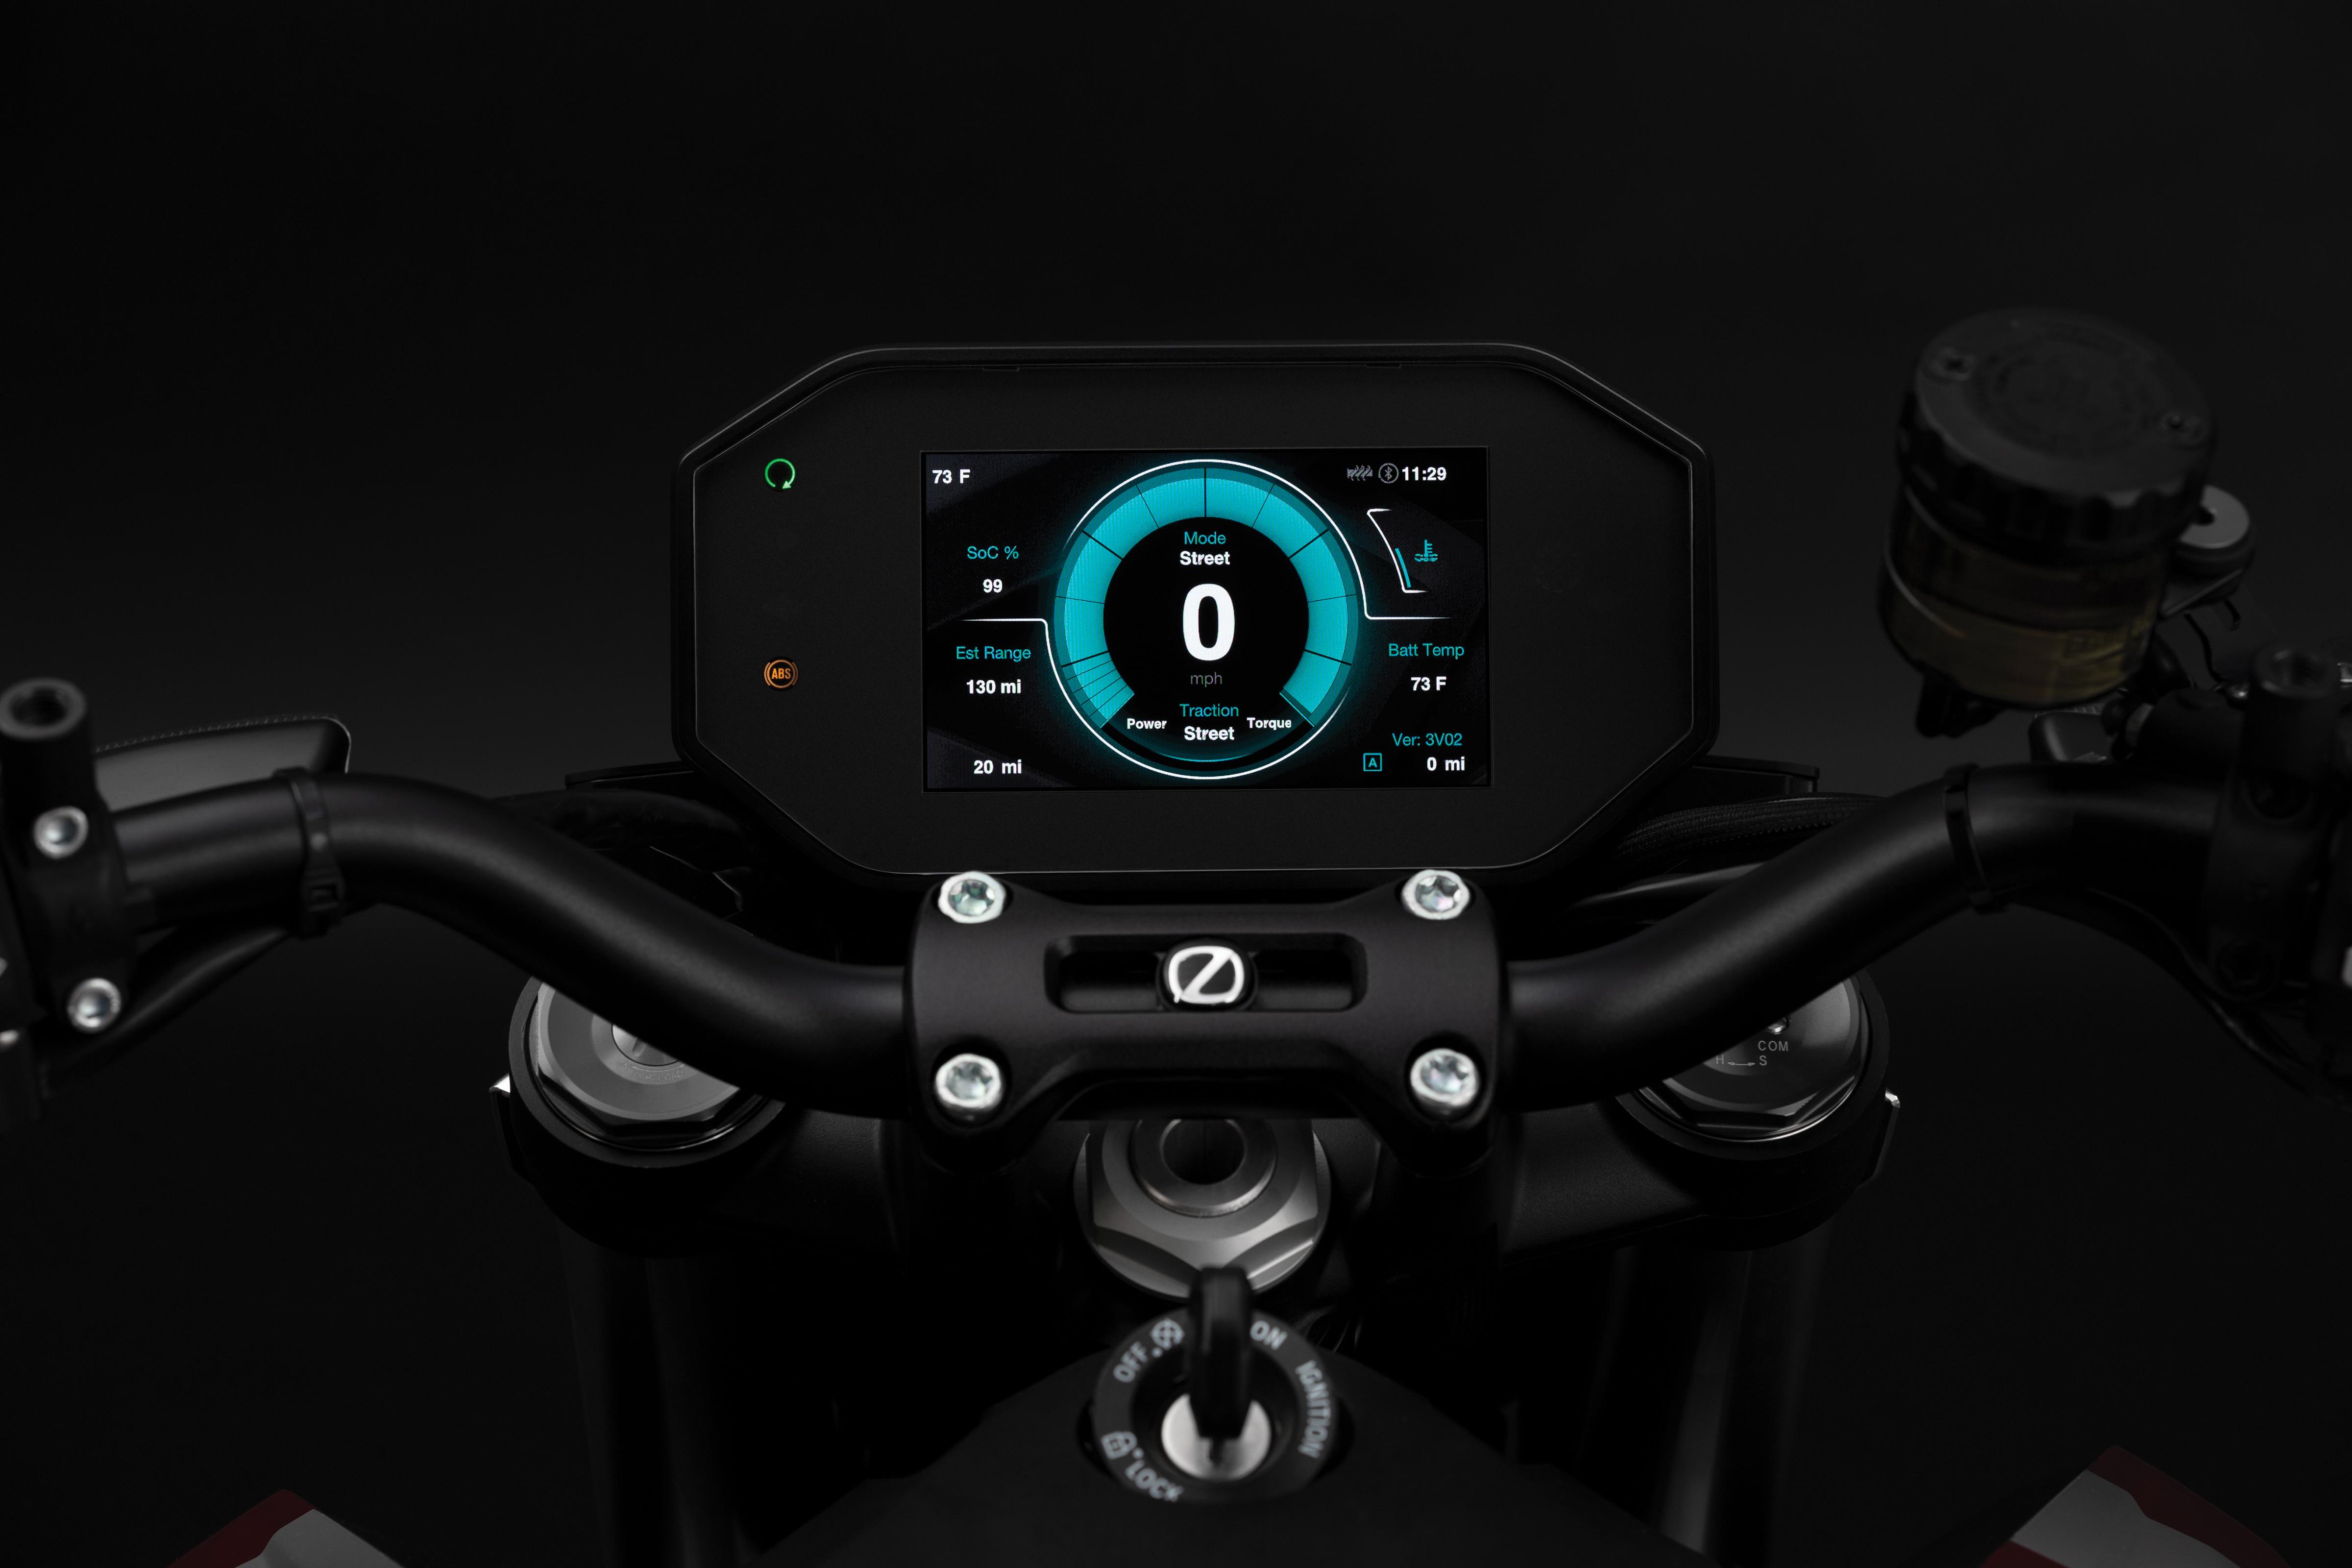 2020 Zero SR/F Electric Motorcycle: Dash